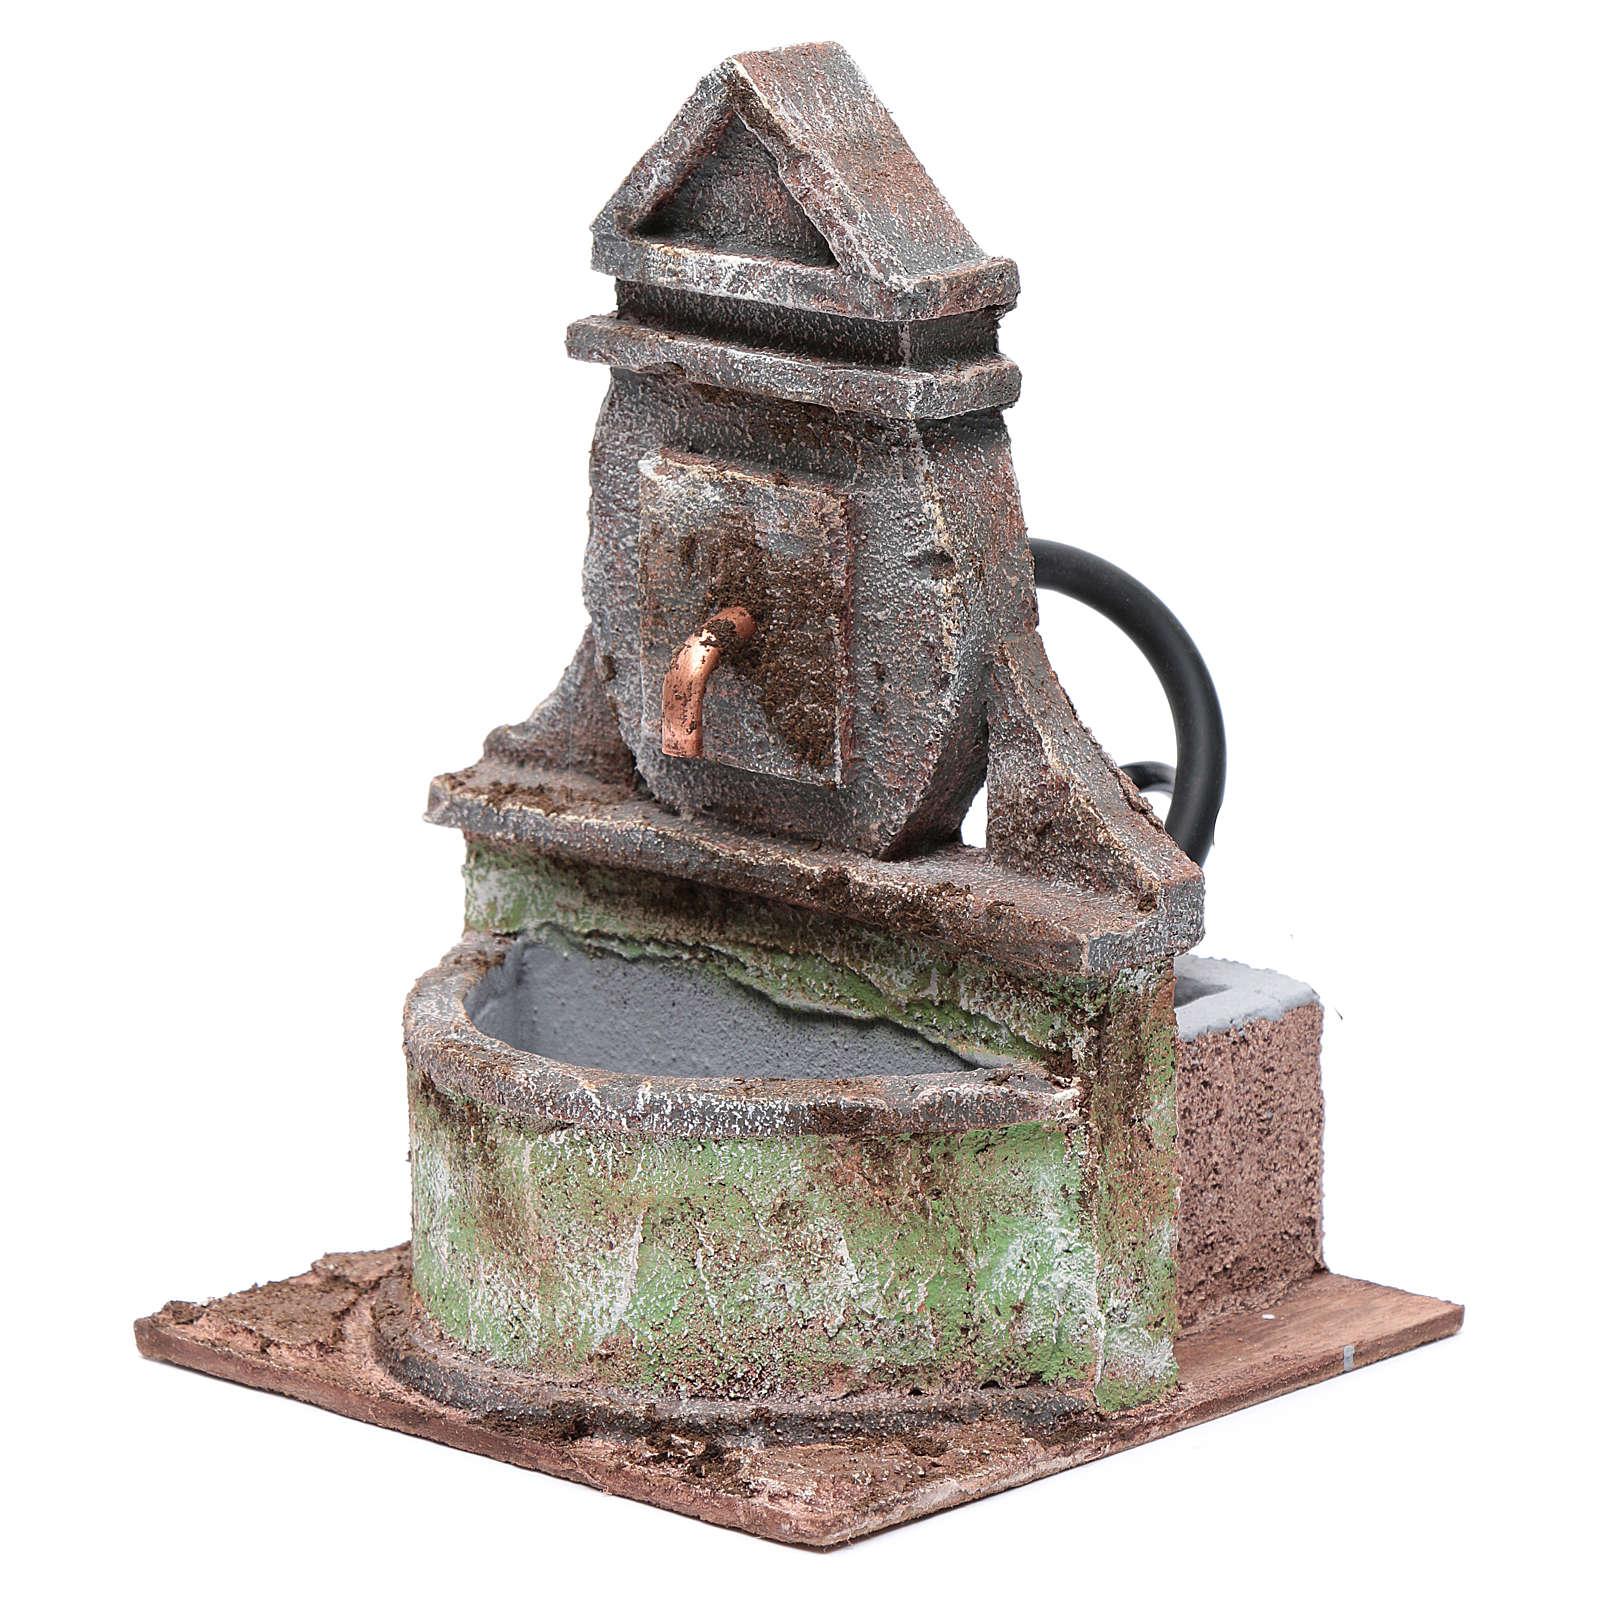 Nativity scene fountain with pump 20x15x15 cm 4